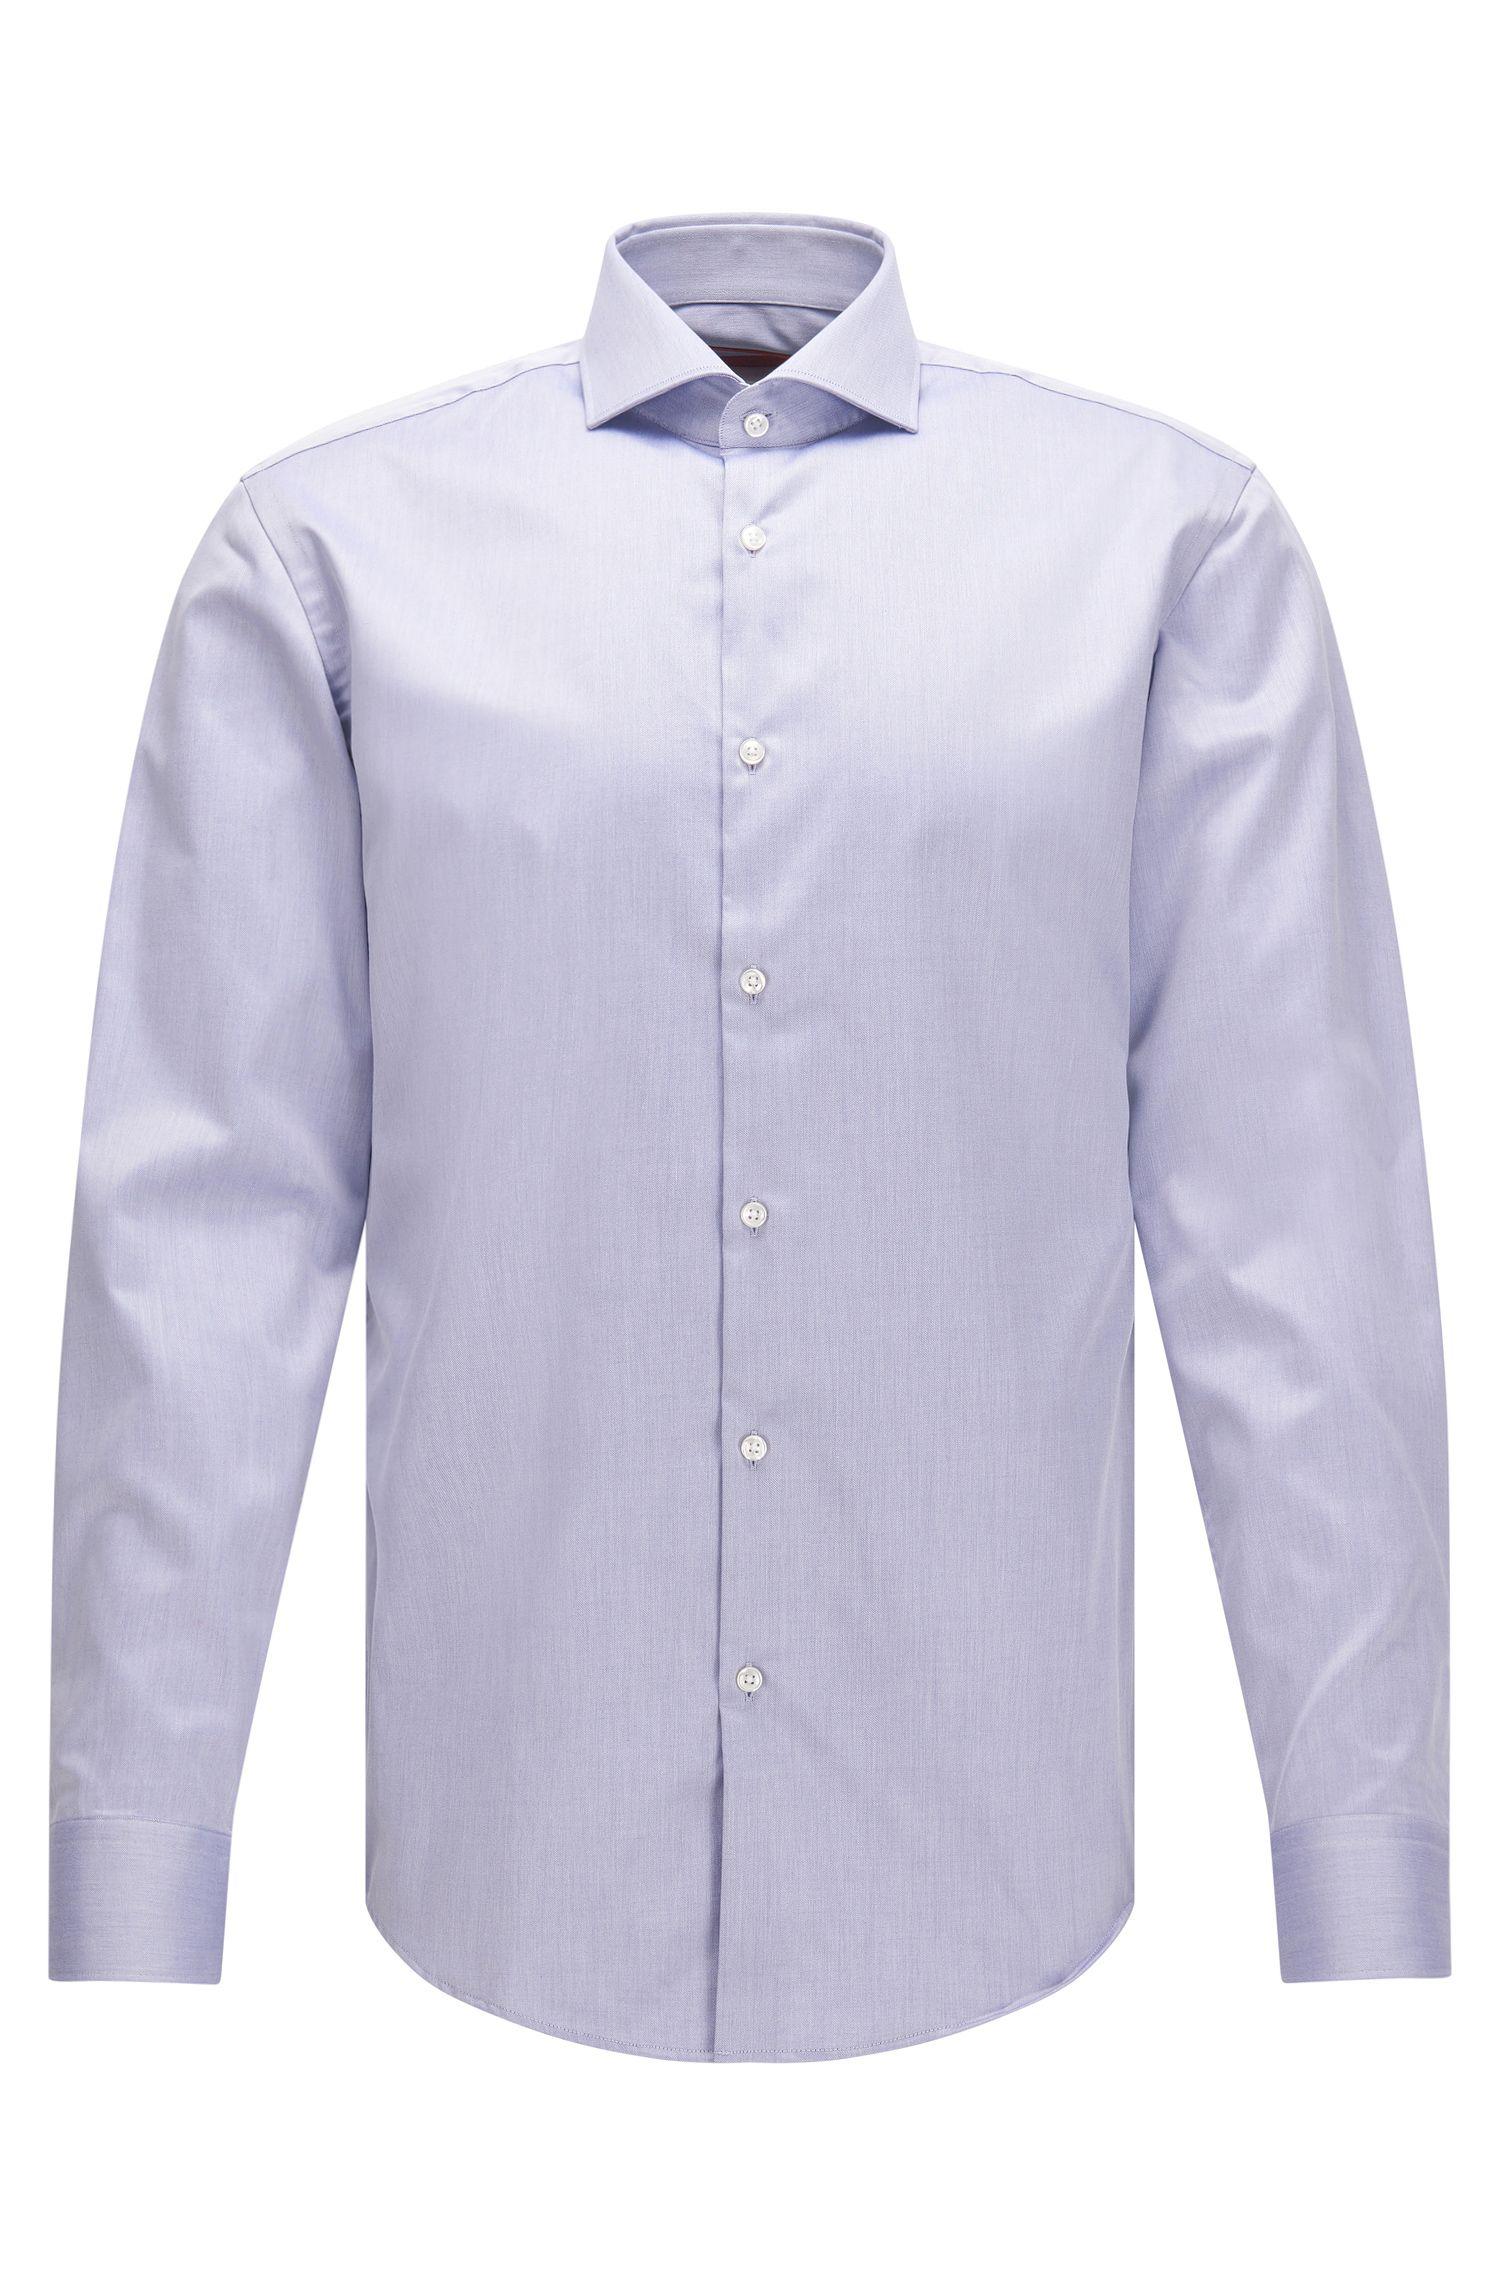 Easy Iron Cotton Poplin Shirt, Slim Fit | C-Jason